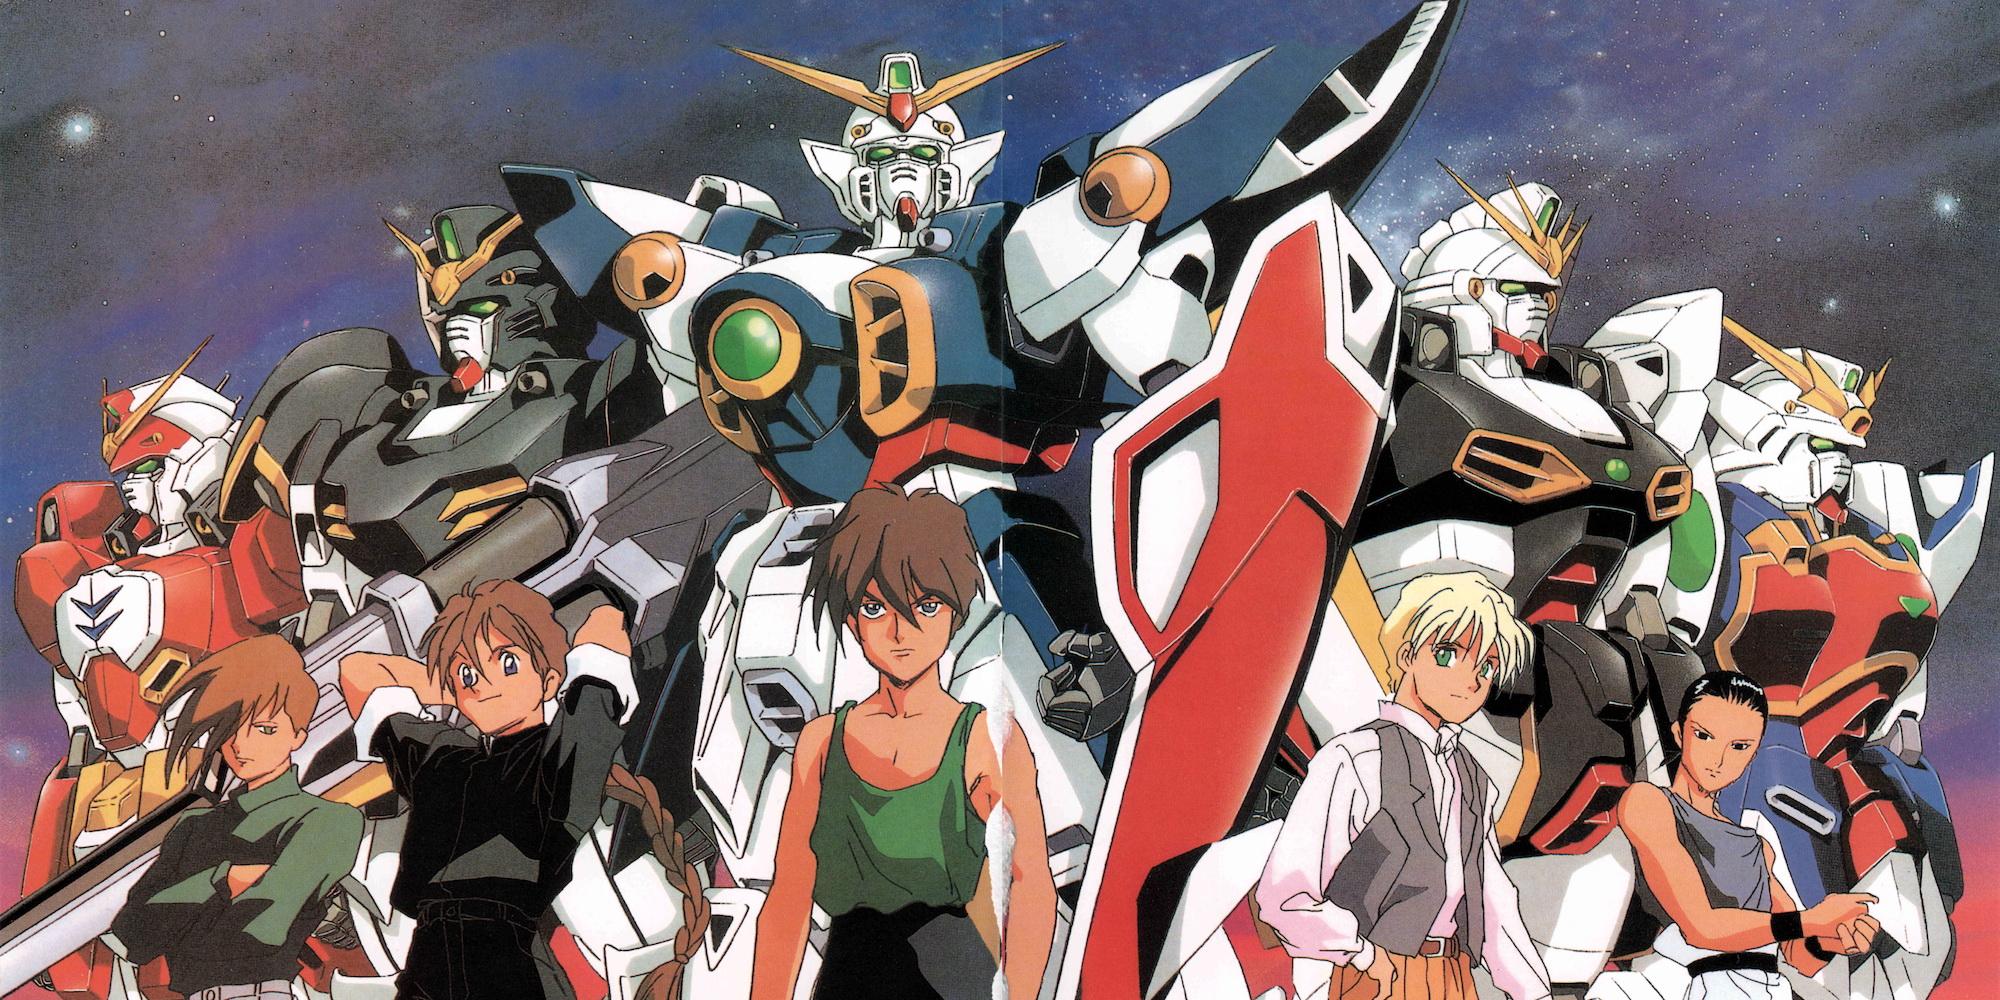 Mobile Suit Gundam Wallpapers Anime Hq Mobile Suit Gundam